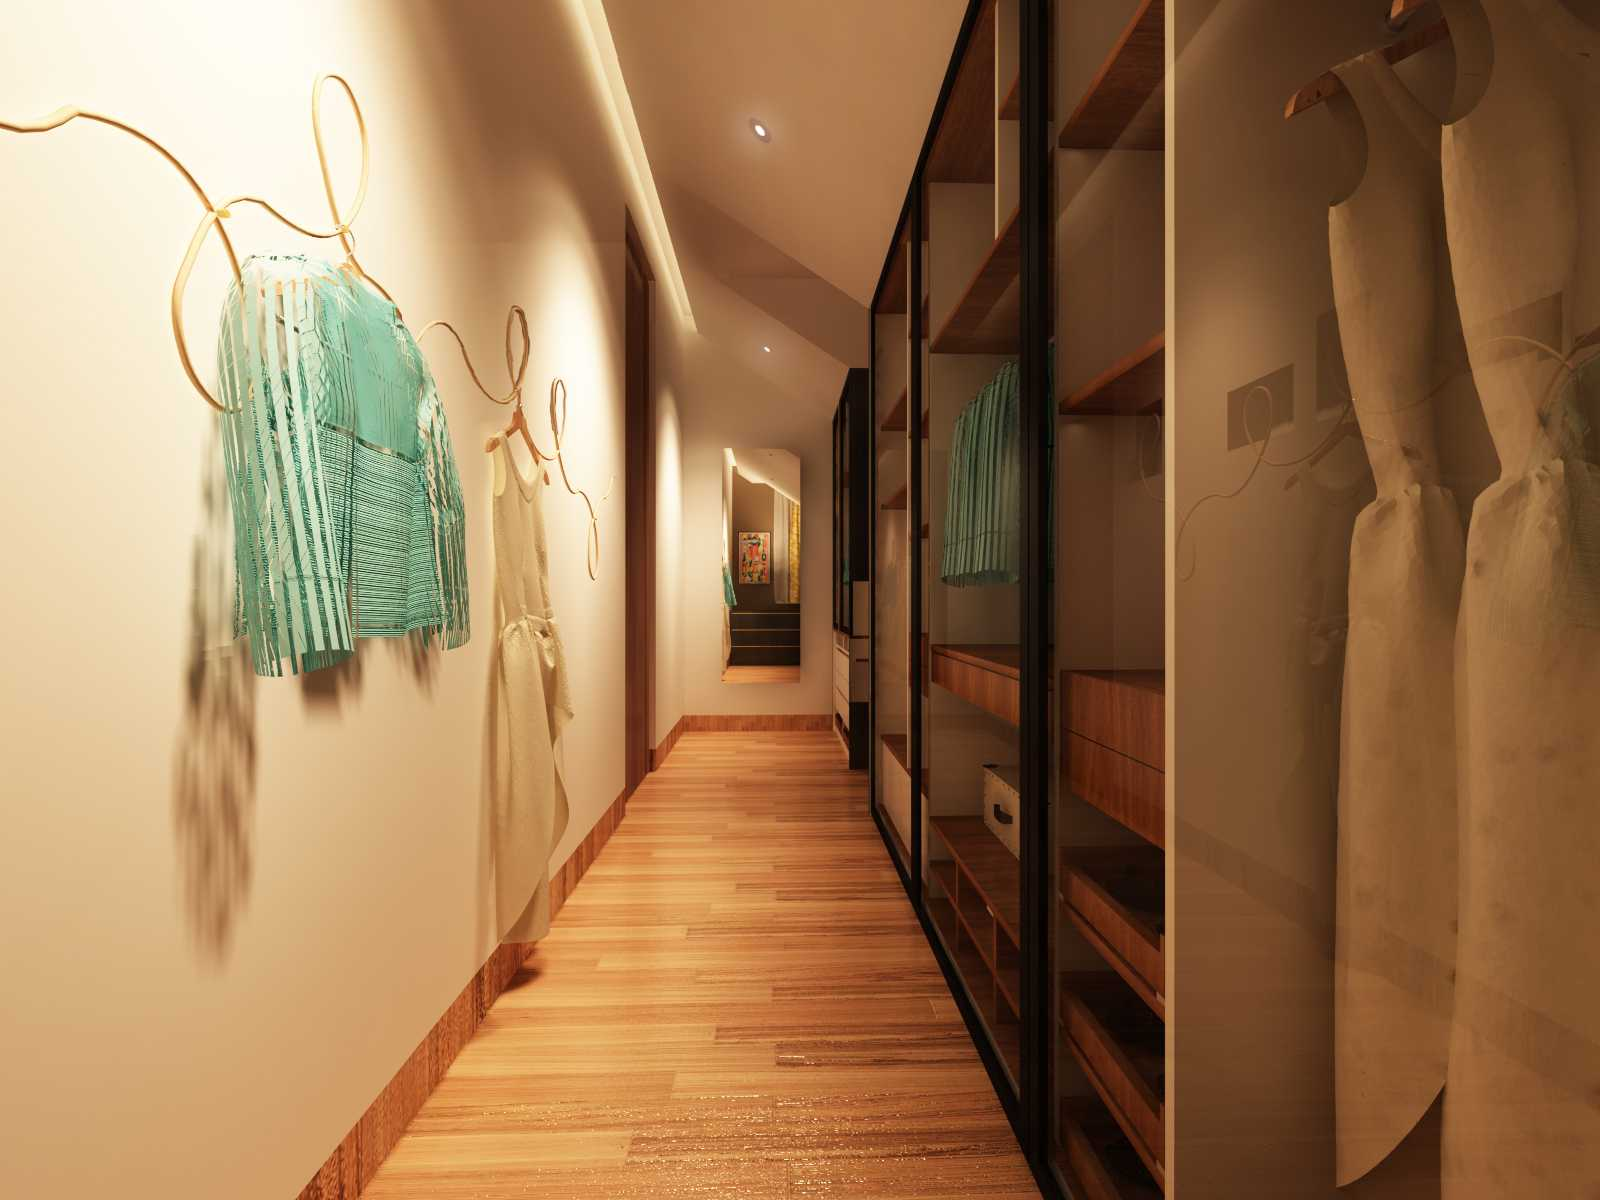 Koerie Design Vgi Residence Blok, Jl. Bgr. Boulevard Blok A2 No.3A, Rt.6/rw.14, West Kelapa Gading, Kelapa Gading, North Jakarta City, Jakarta 14240, Indonesia Blok, Jl. Bgr. Boulevard Blok A2 No.3A, Rt.6/rw.14, West Kelapa Gading, Kelapa Gading, North Jakarta City, Jakarta 14240, Indonesia Walk-In Closet Eklektik  40261